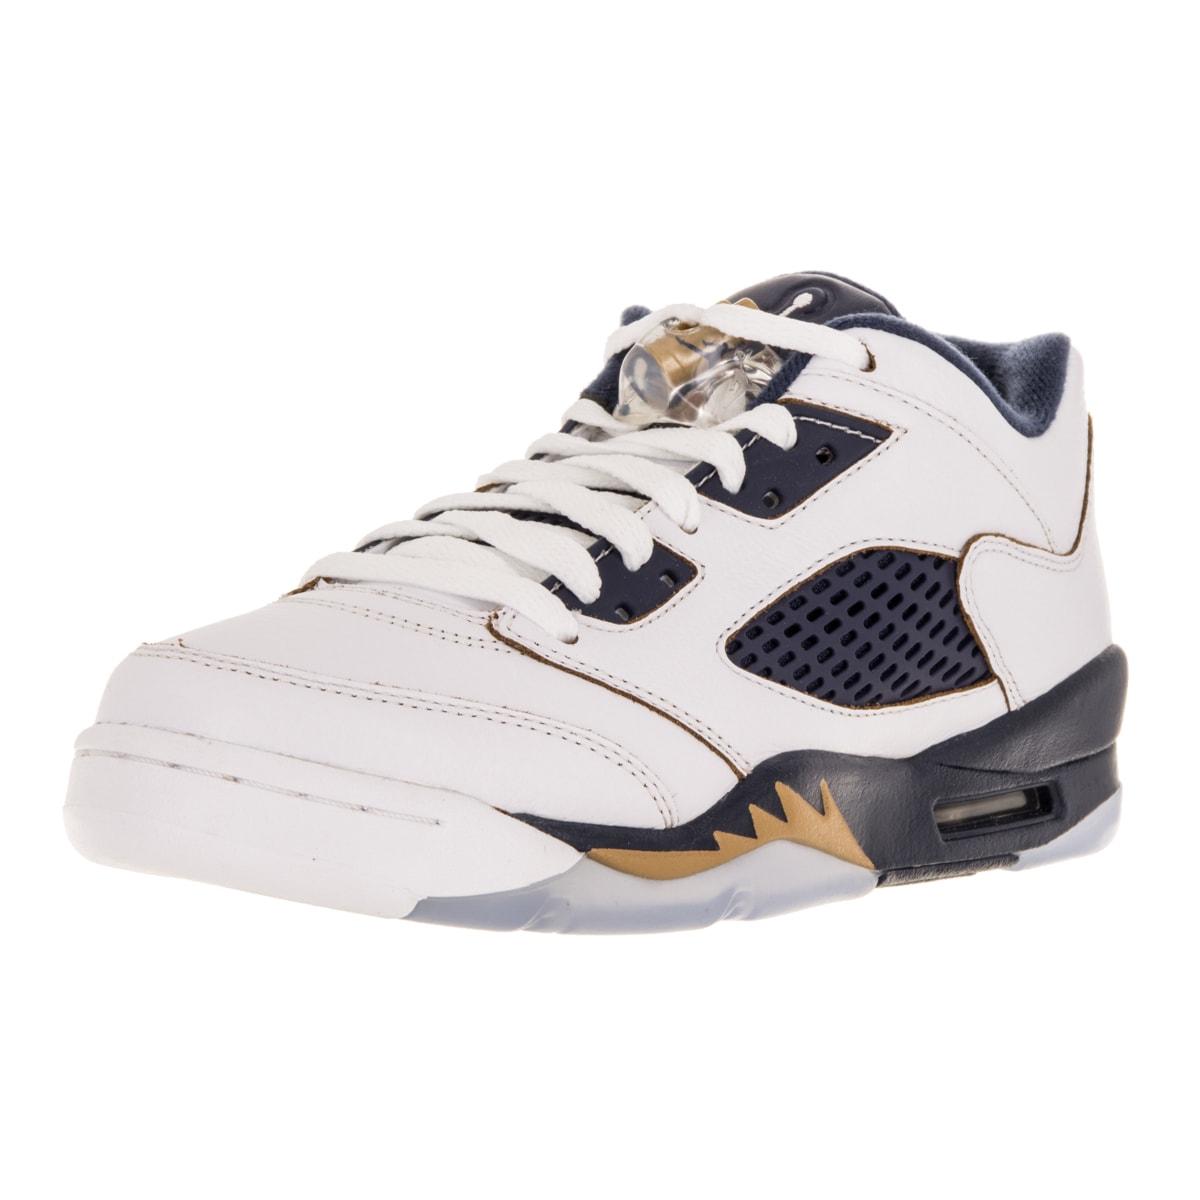 wholesale dealer a55e2 fa1cf Shop Nike Jordan Kid s Air Jordan 5 Retro Low (Gs) White Metallic Gold Mid  Navy Basketball Shoe - Free Shipping Today - Overstock - 12322034